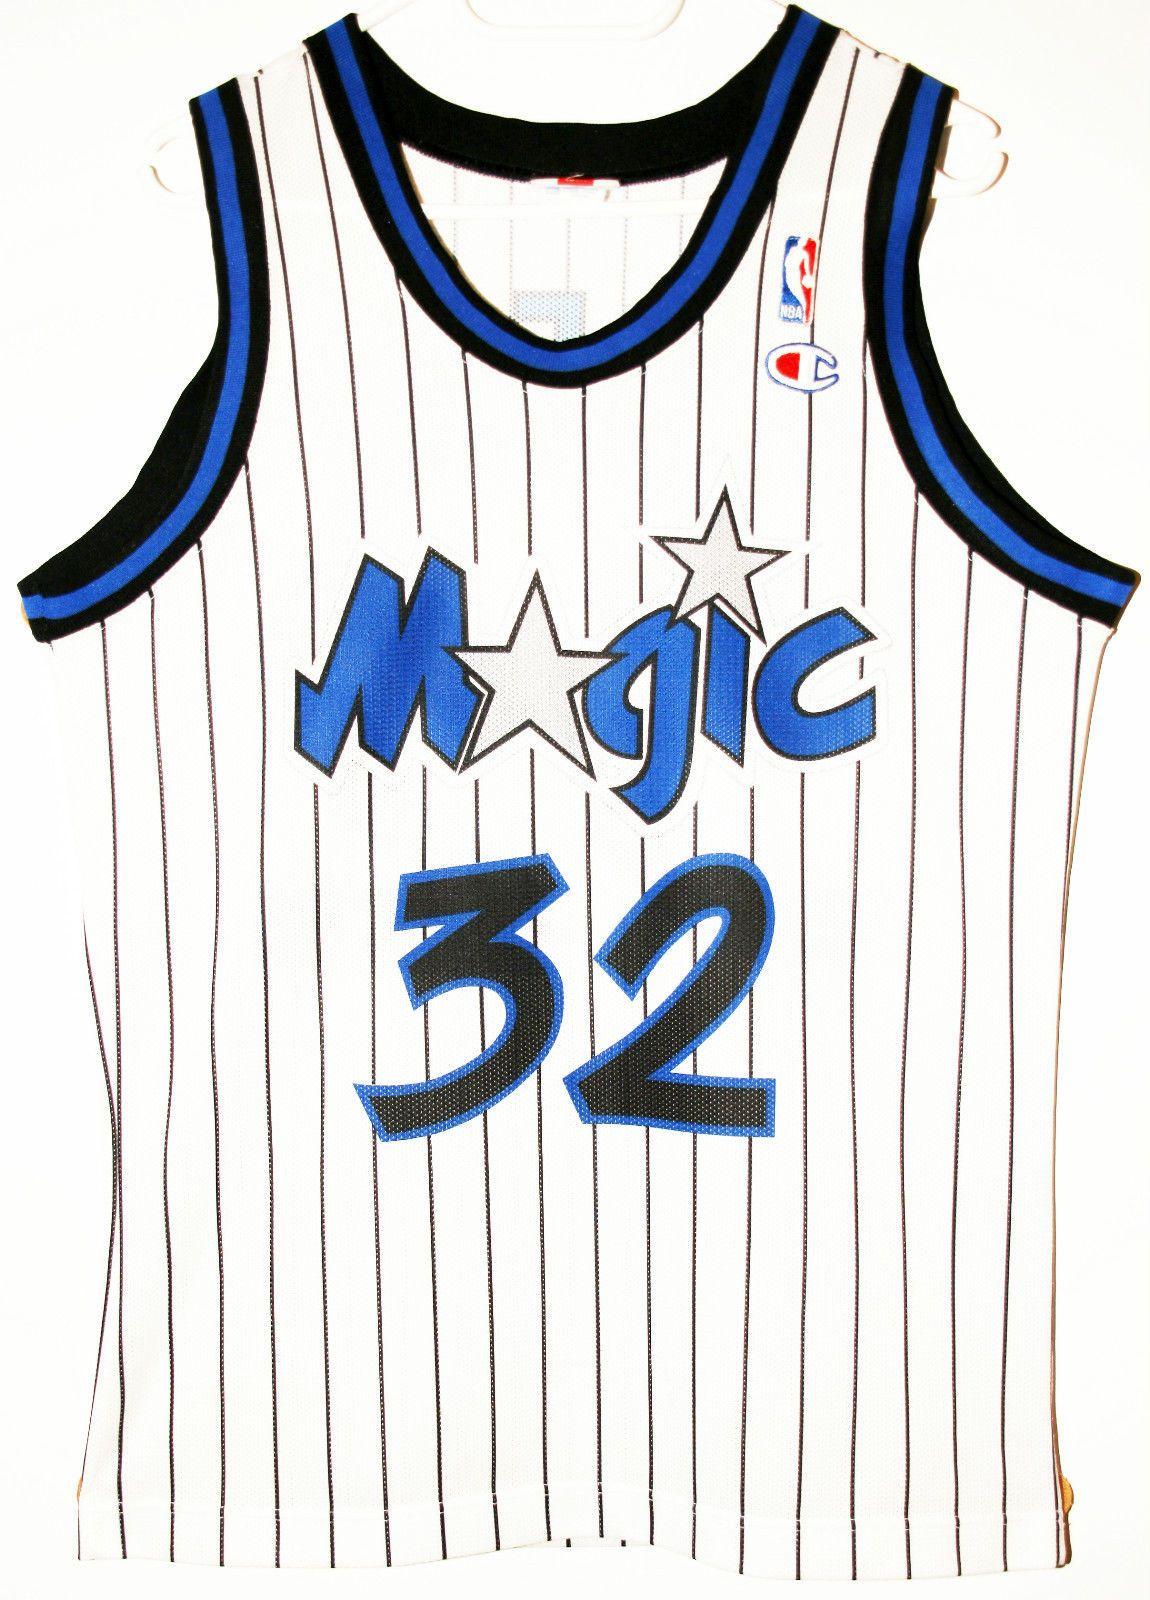 Champion NBA Basketball Orlando Magic #32 Shaquille O'Neal Trikot / Jersey Size S - 47,90€ #nba #basketball #trikot #jersey #ebay #sport #fitness #fanartikel #merchandise #usa #america #fashion #mode #collectable #memorabilia #allbigeverything